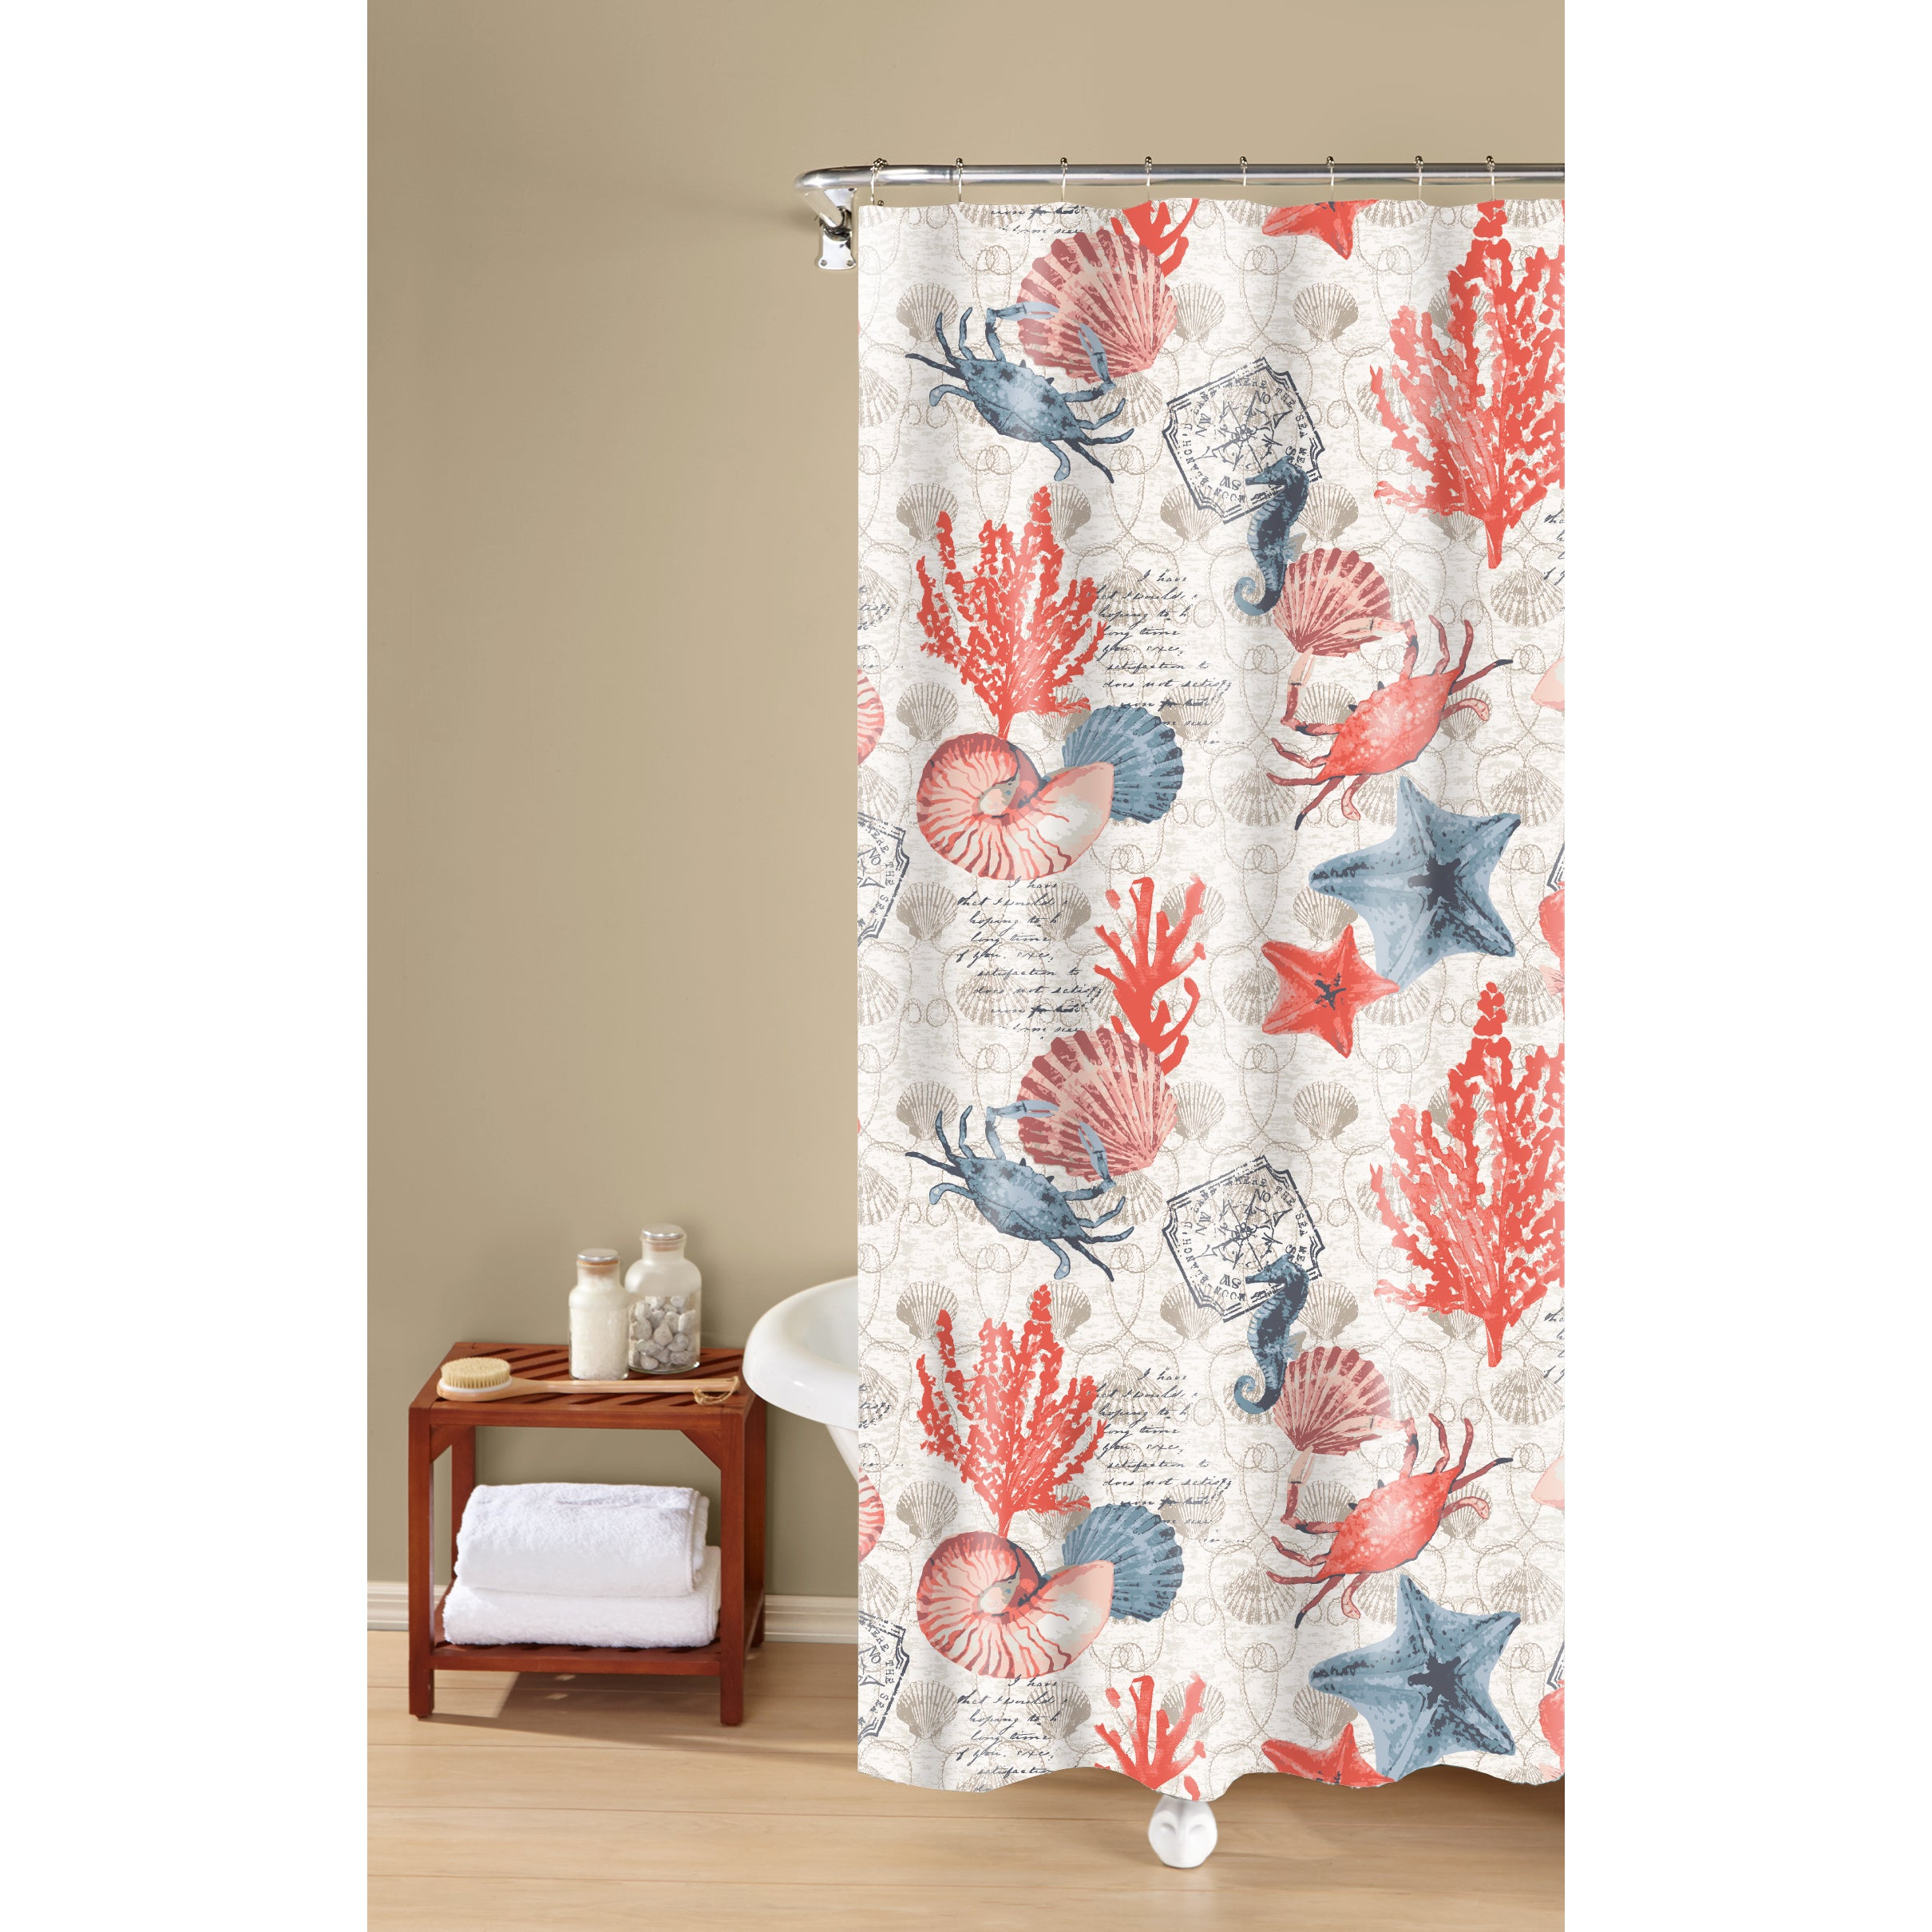 Novelty Bath & Towels | Shop our Best Bedding & Bath Deals Online at ...